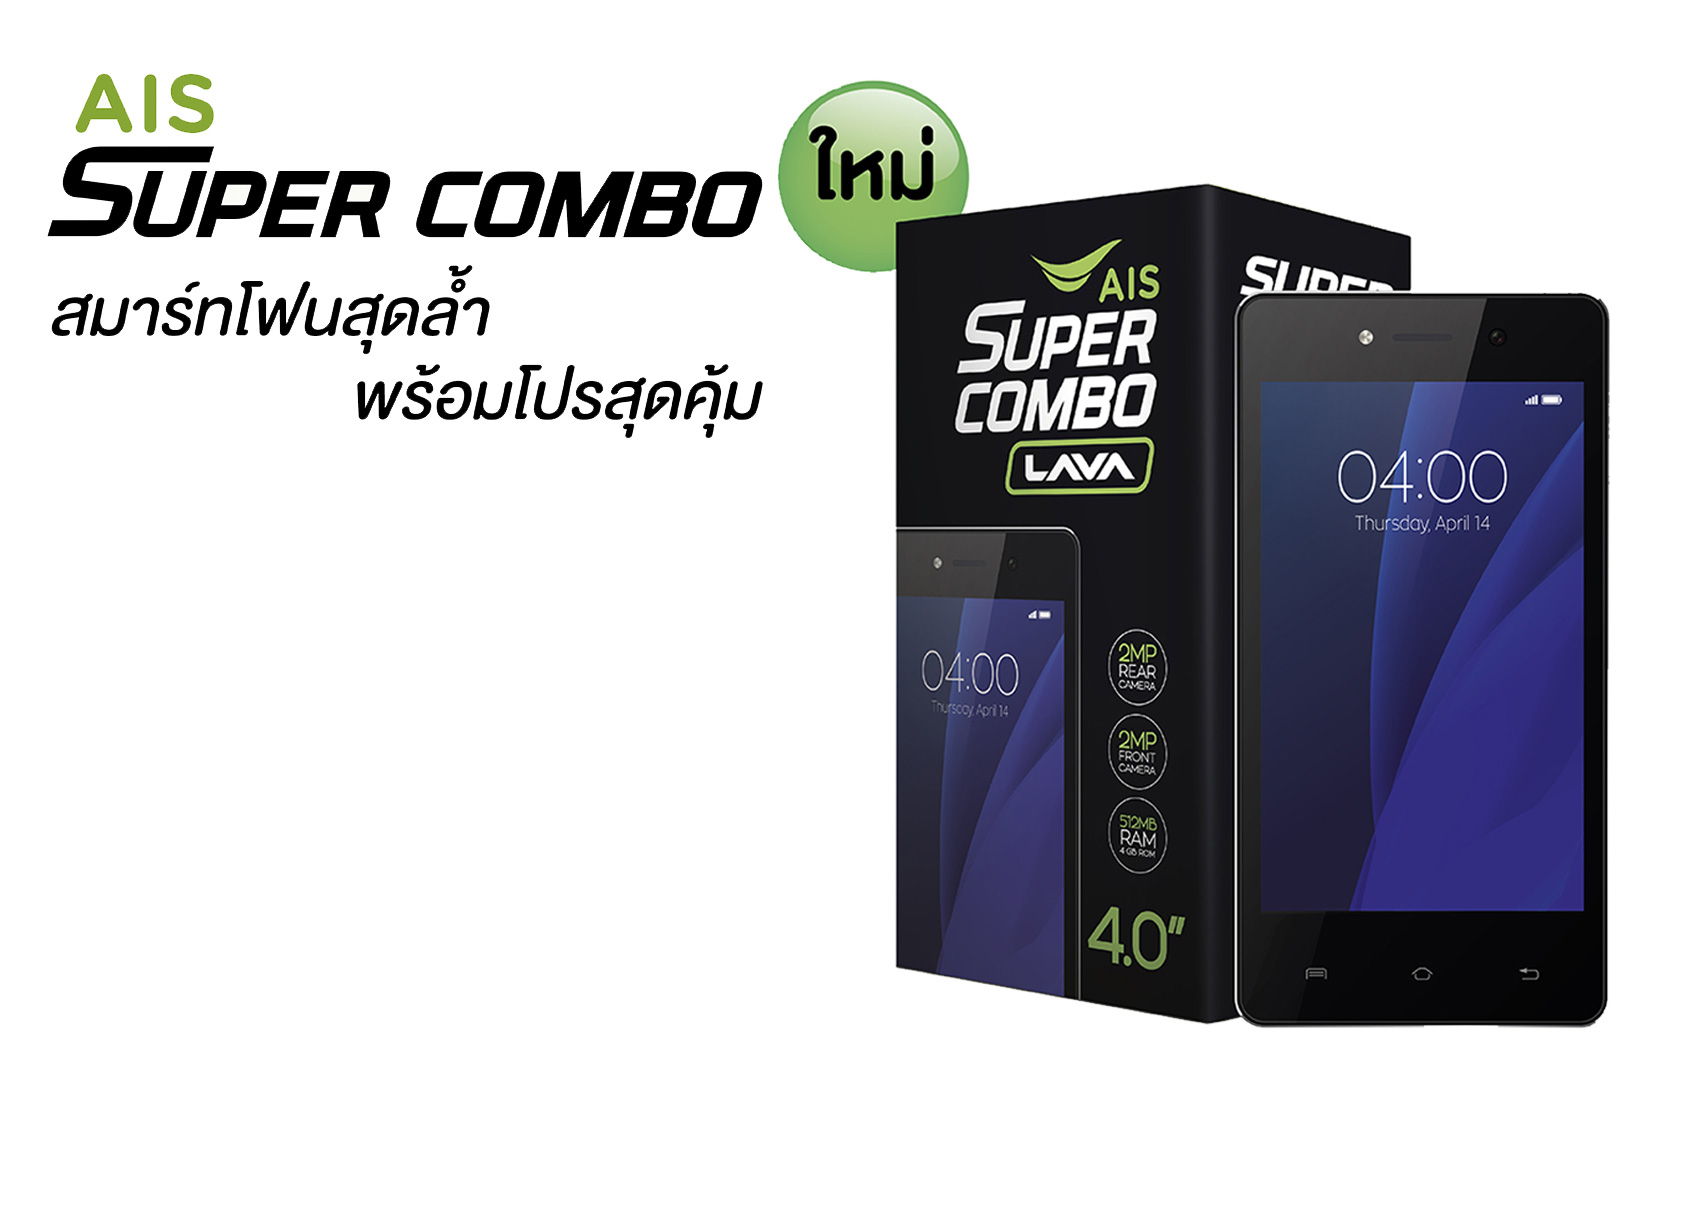 AIS Super Combo LAVA iris 515 ไม่ล็อคชิมใส่ได้ทุกชิม เครื่องใหม่ไม่แกะชีลคะ ฟรี EMS เก็บเงินปลายทาง